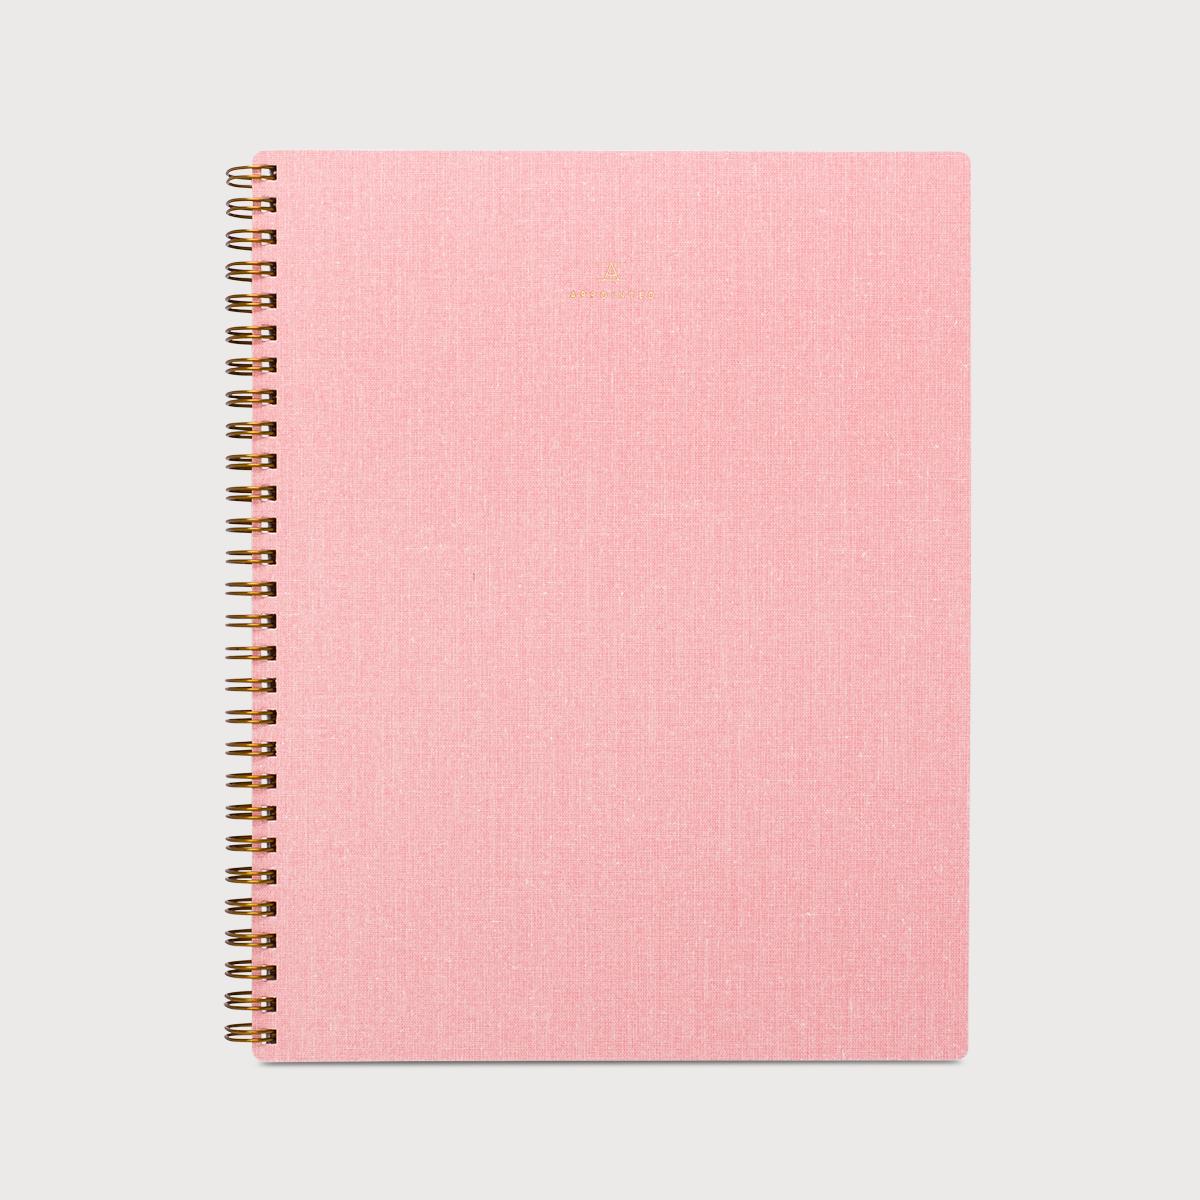 Notebook-Blossom-Pink-Web_298980ba-b2e1-4e45-a5a8-4224c5baa8cc.png